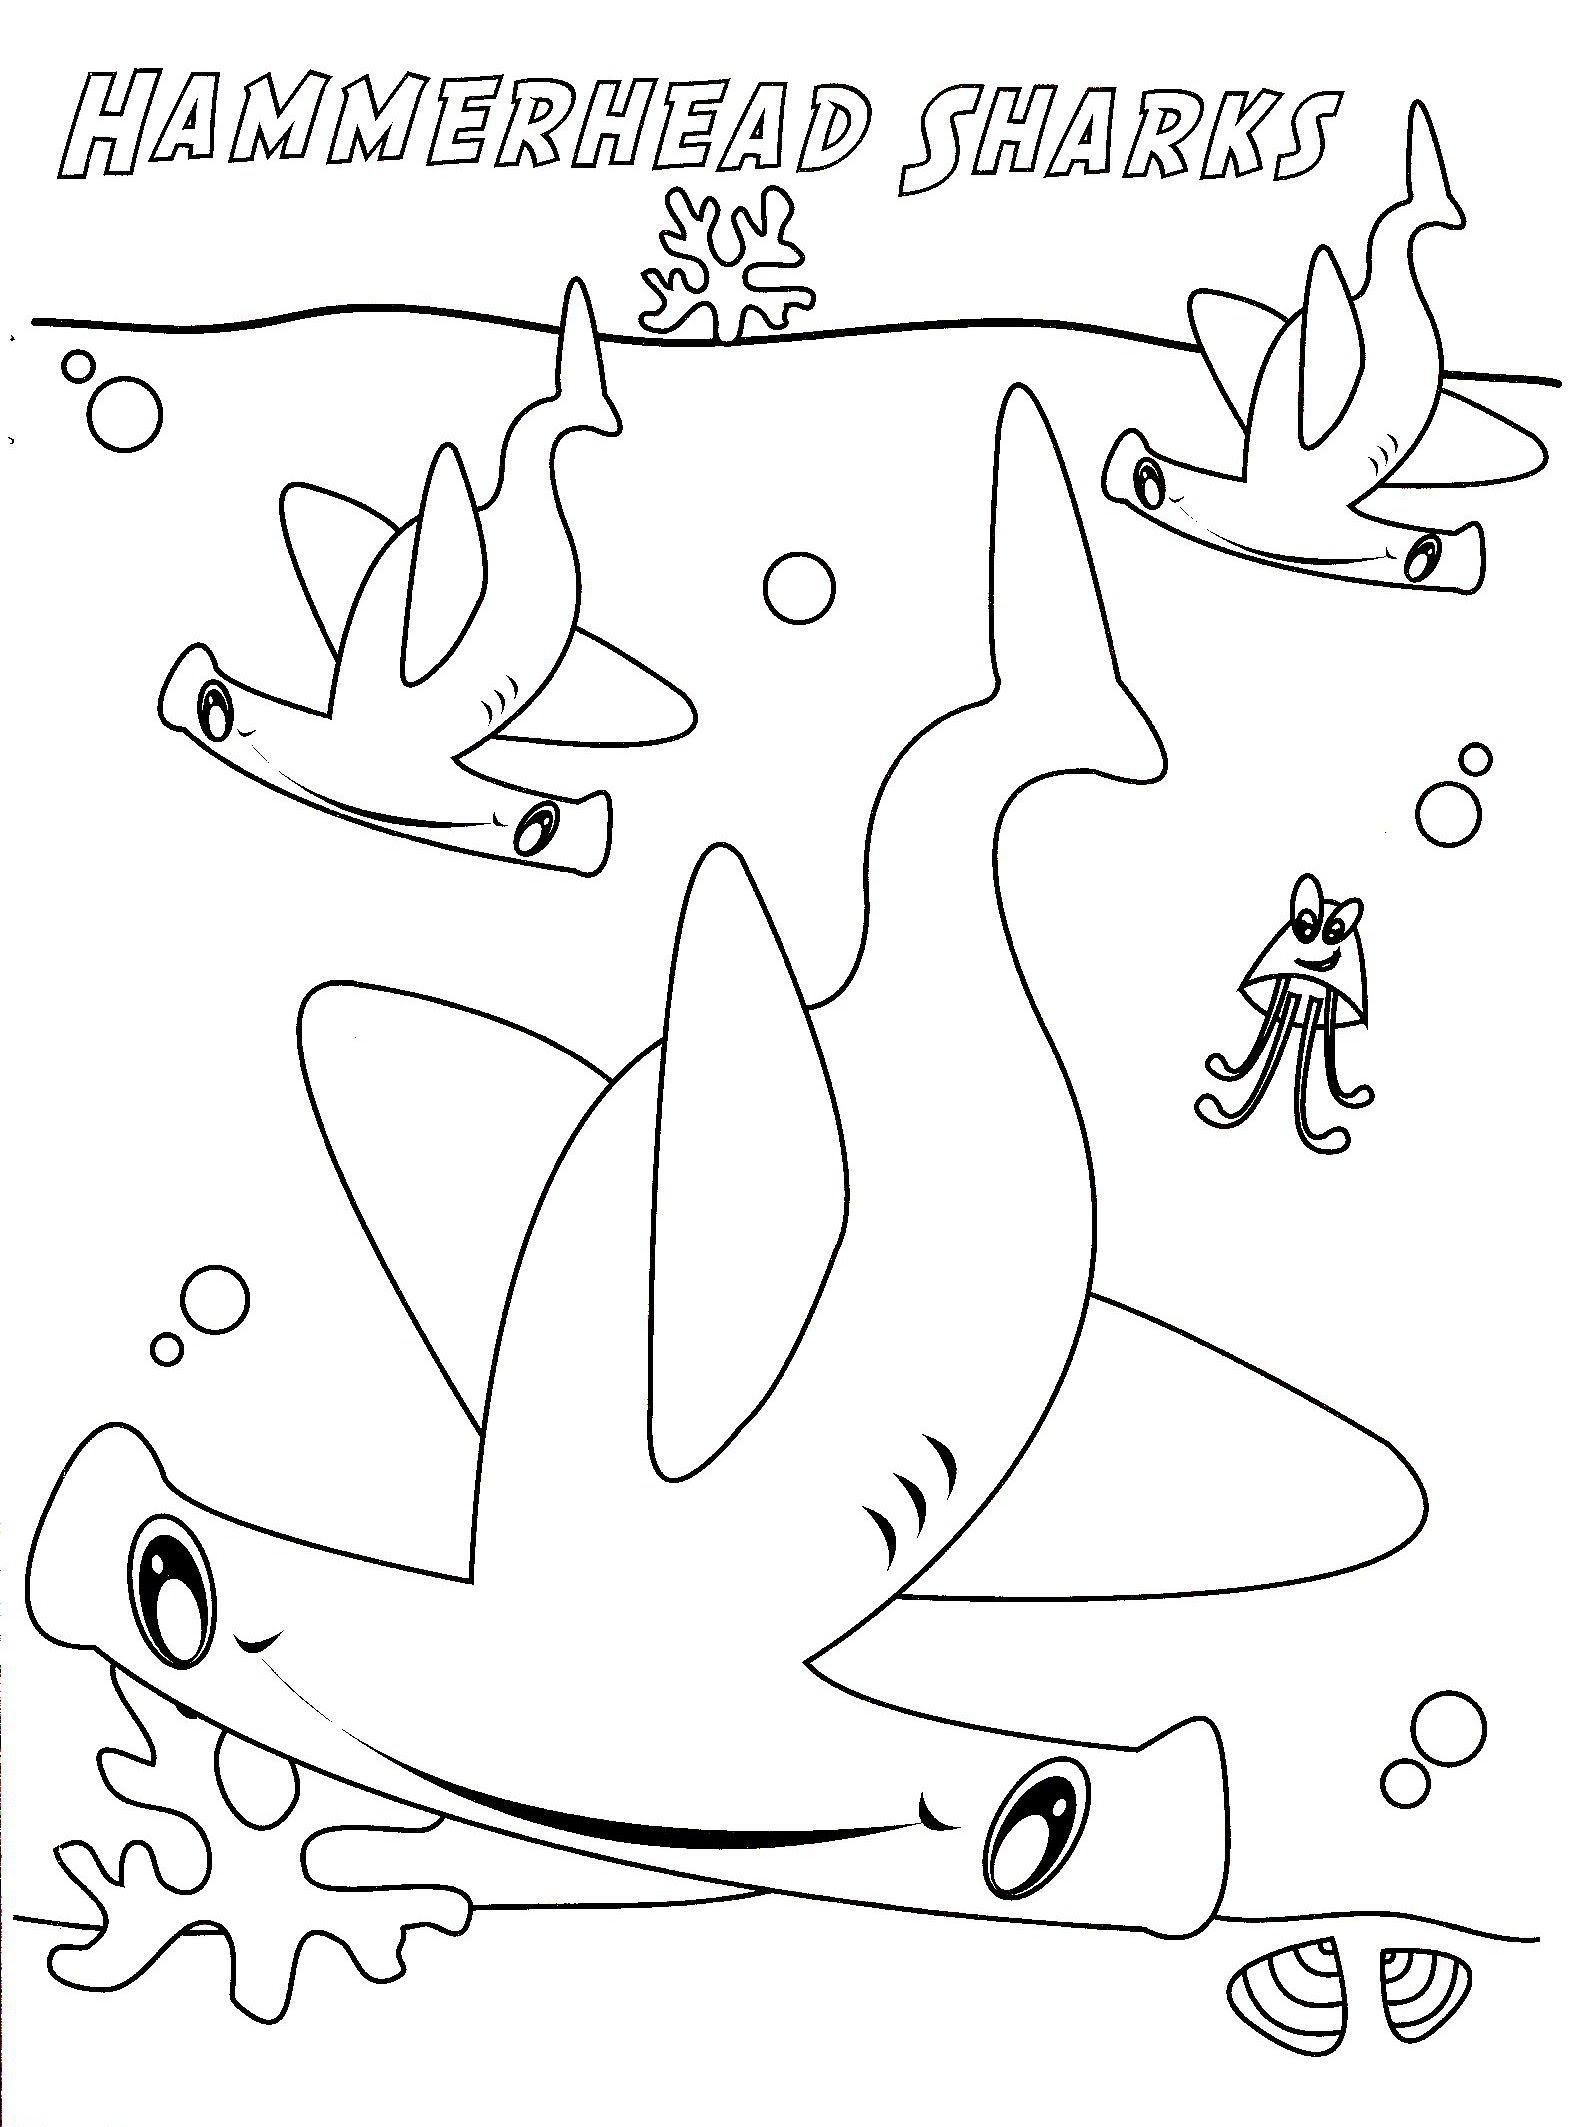 Hammerhead Shark Drawing at GetDrawings | Free download